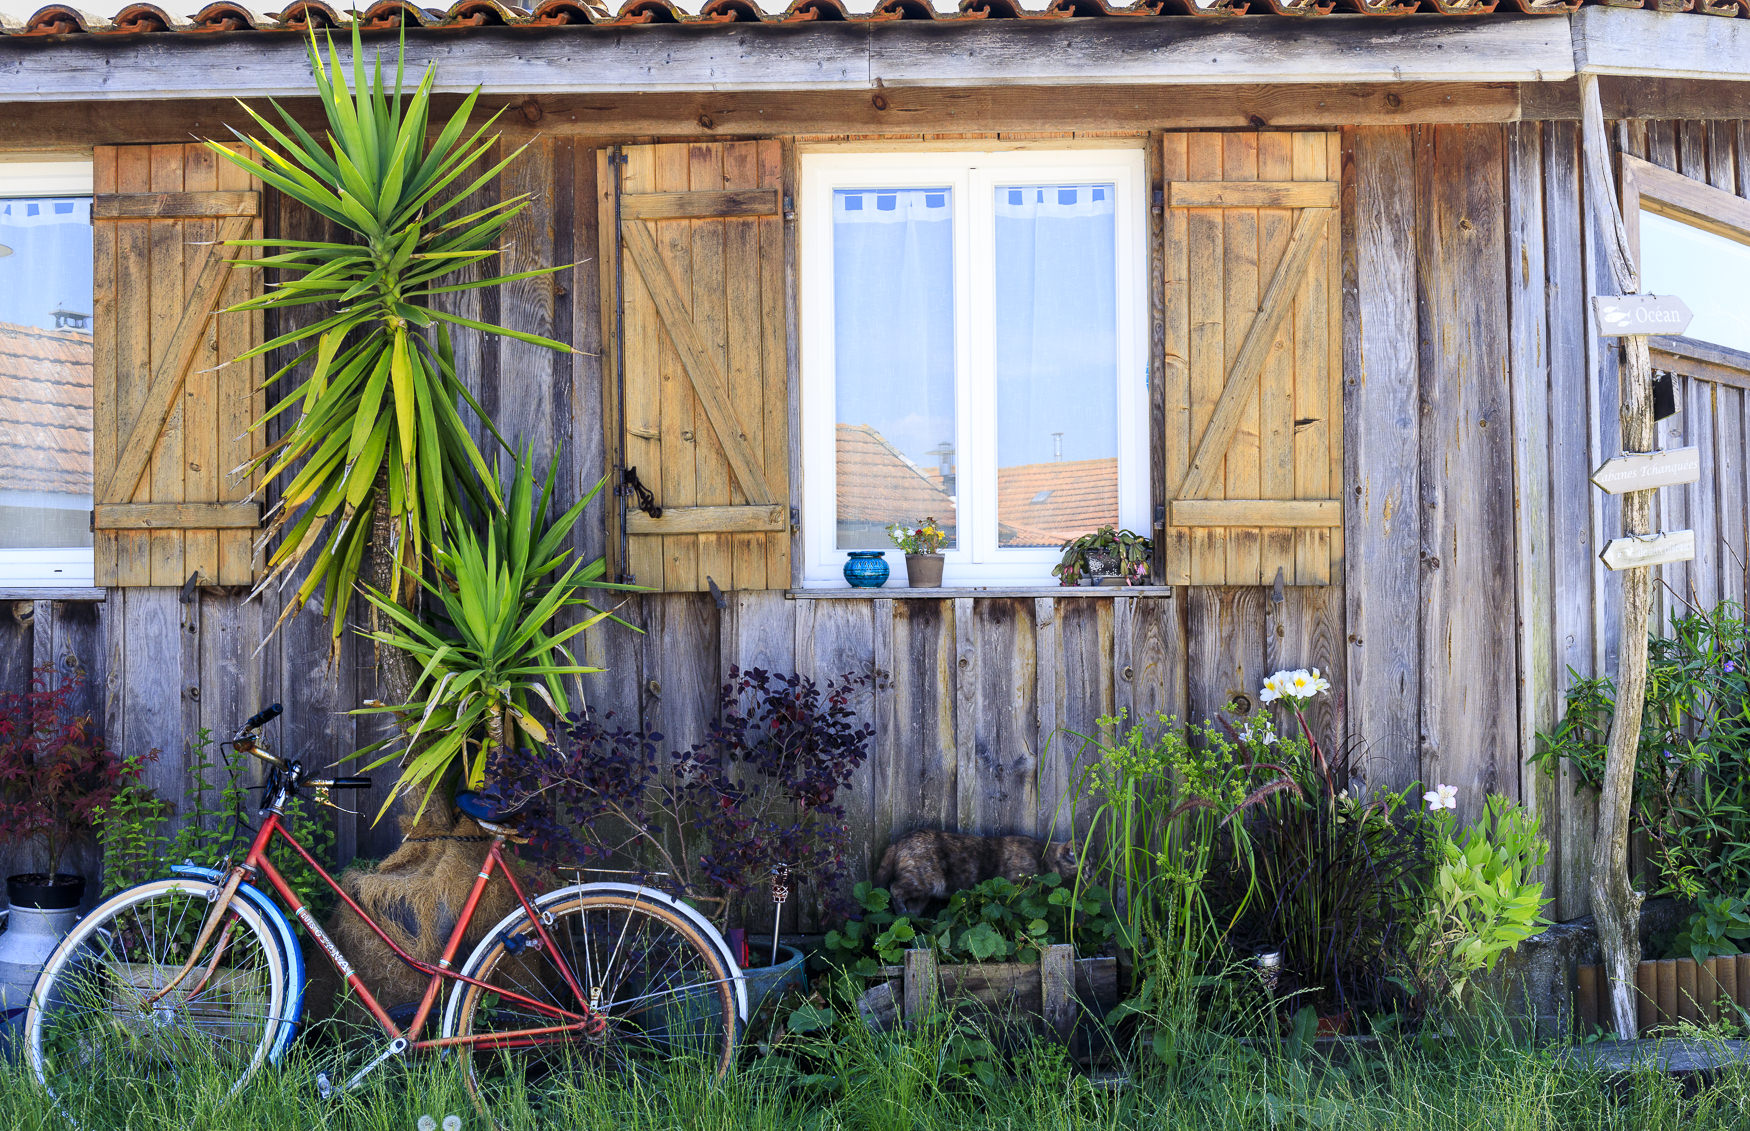 Piraillan-Cap Ferret-France-SH-Jul18-HiRes05.jpg